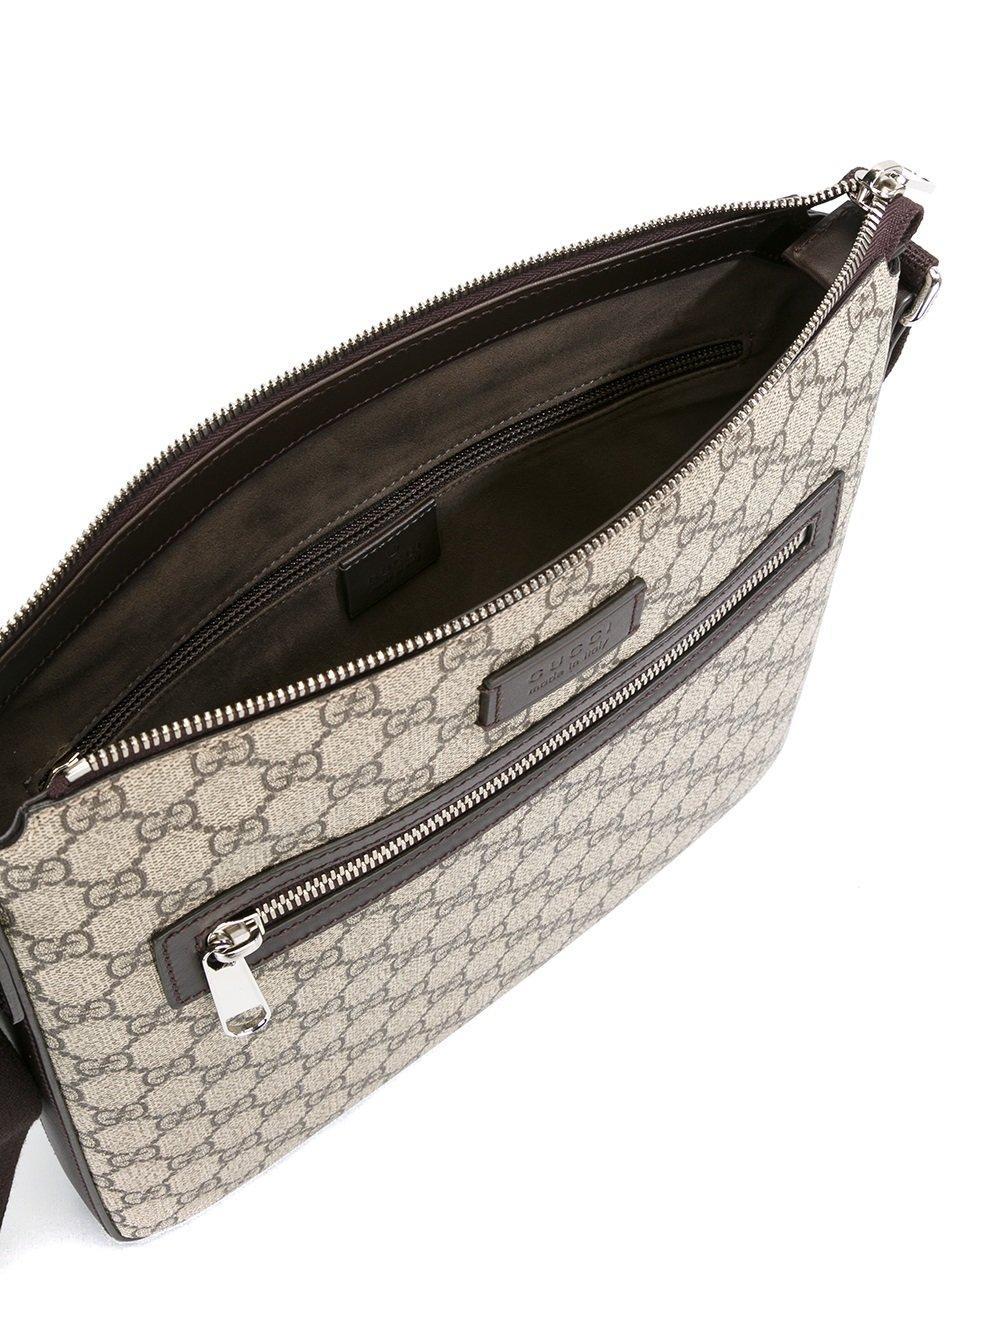 6df696fb7a01 Gucci Gg Supreme Messenger Bag for Men - Lyst